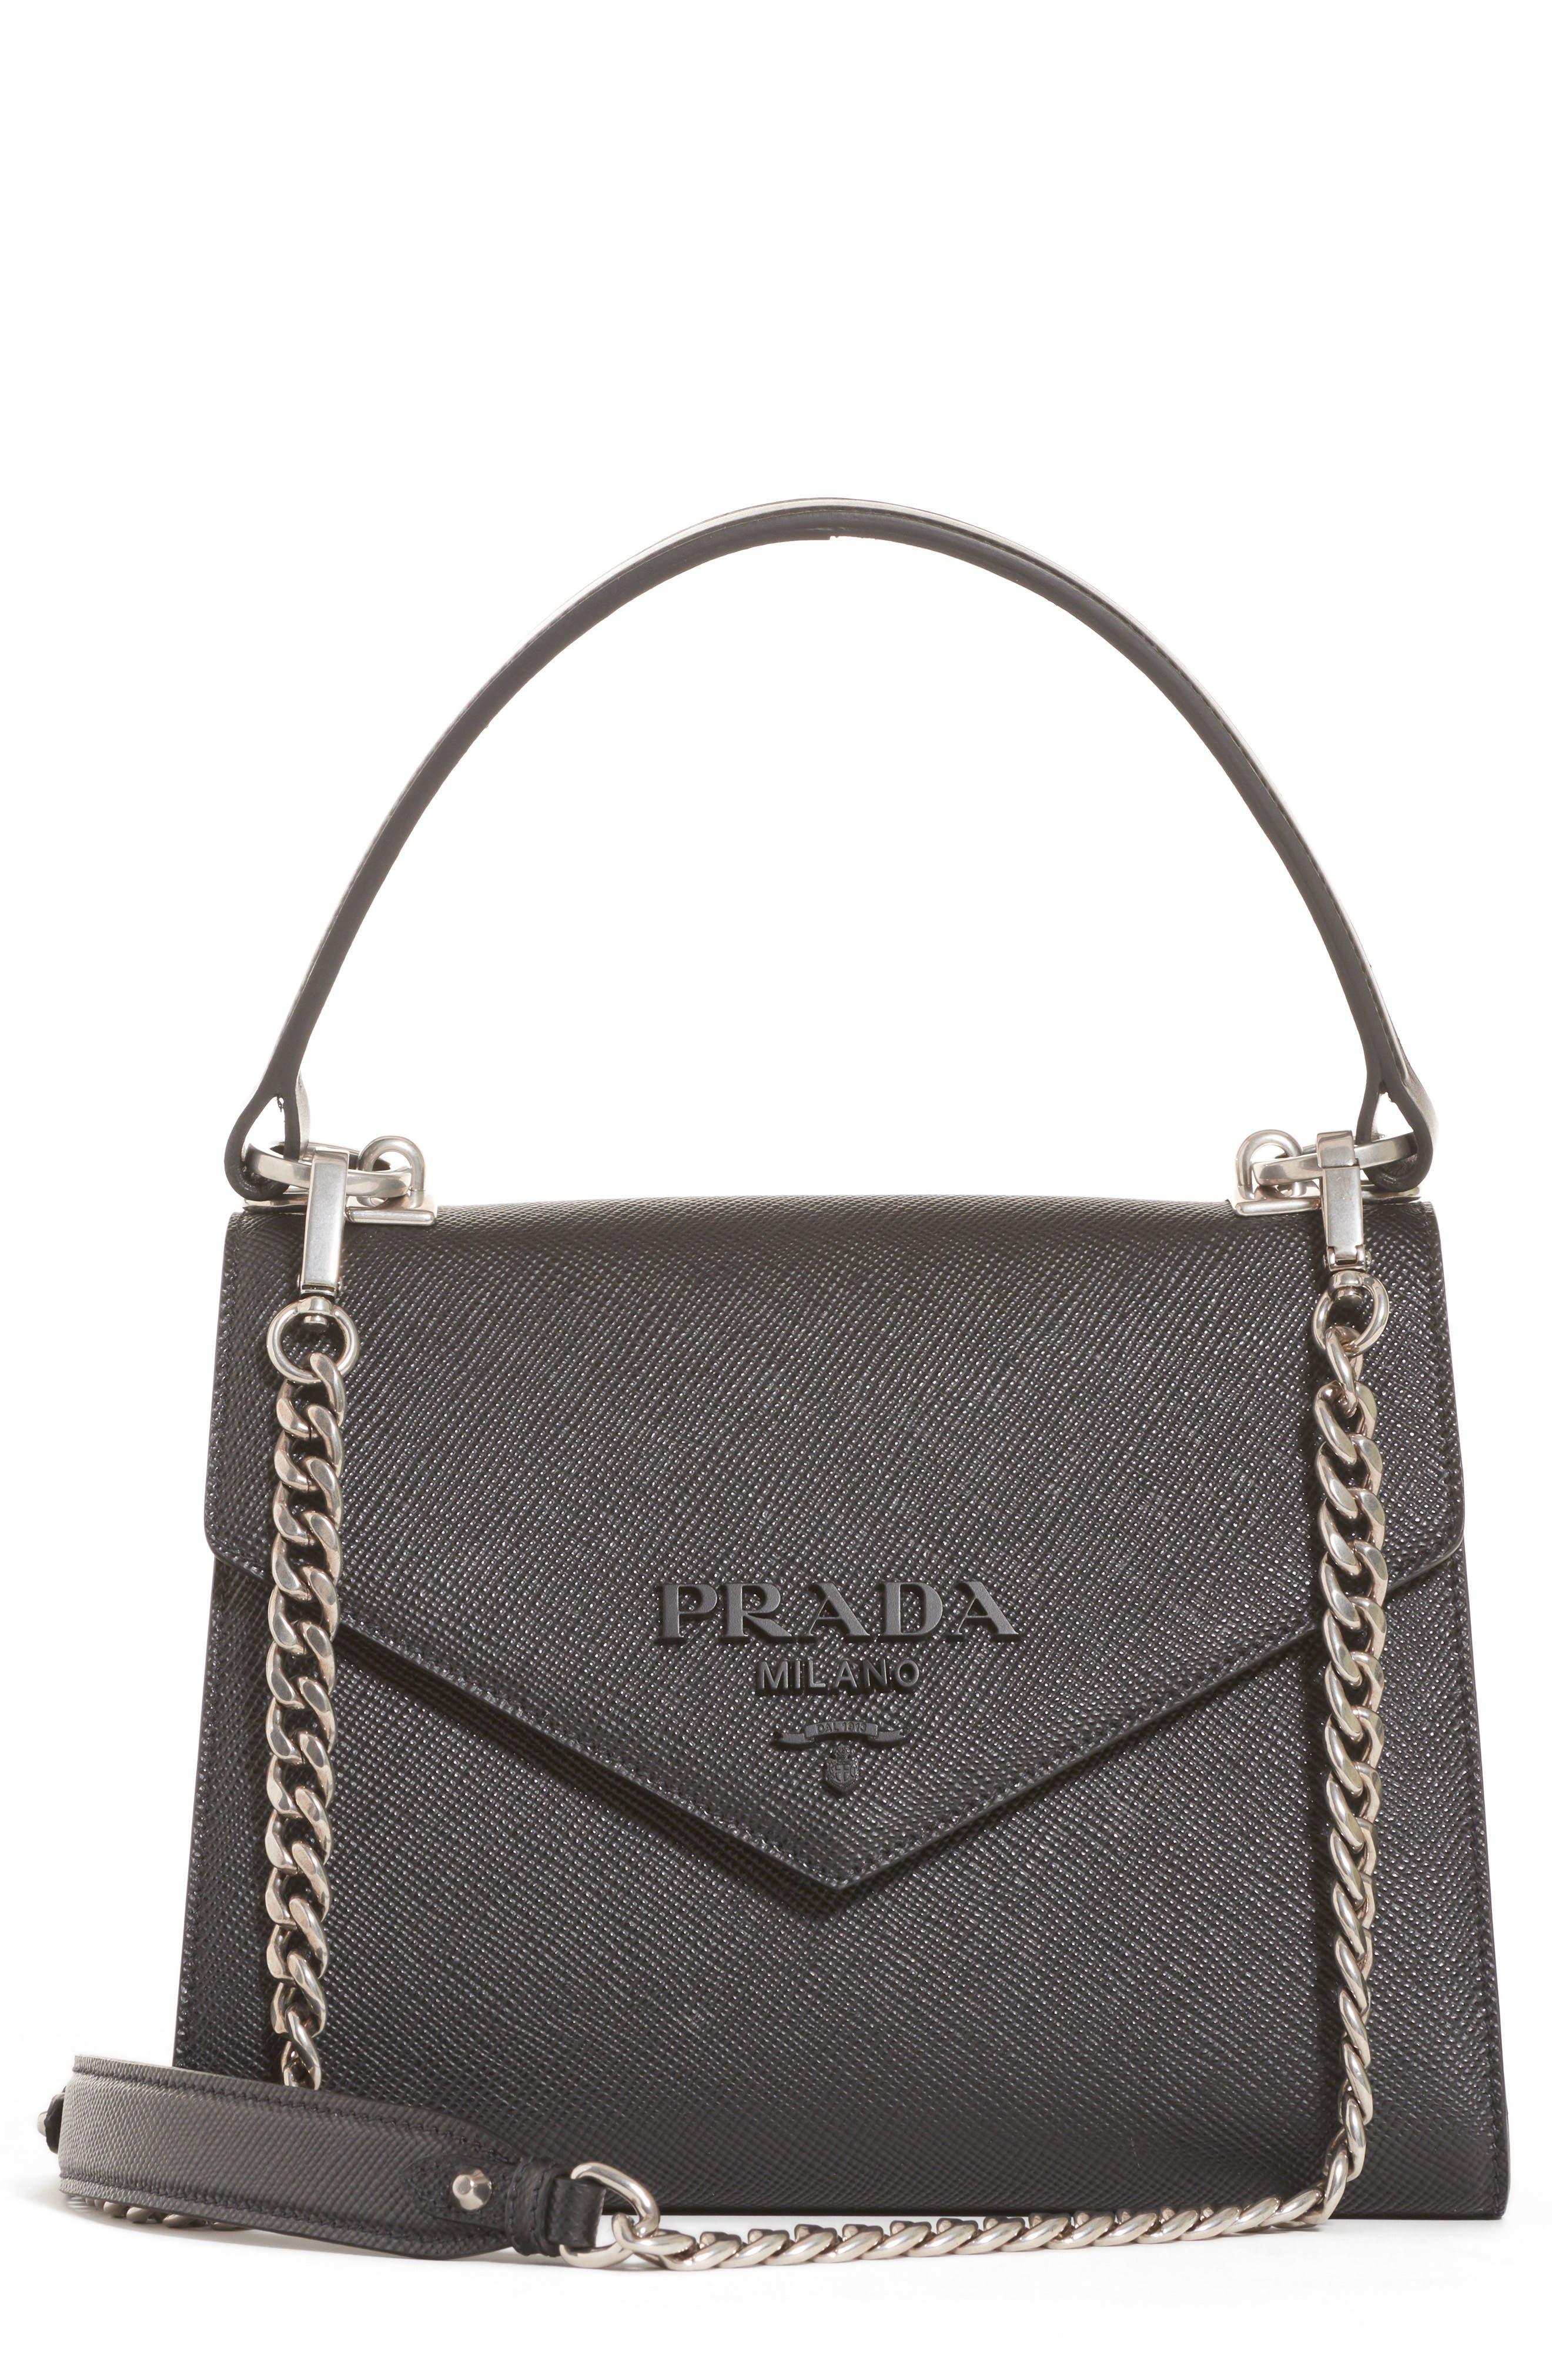 Monochrome Logo Top Handle Leather Handbag,                             Main thumbnail 1, color,                             NERO